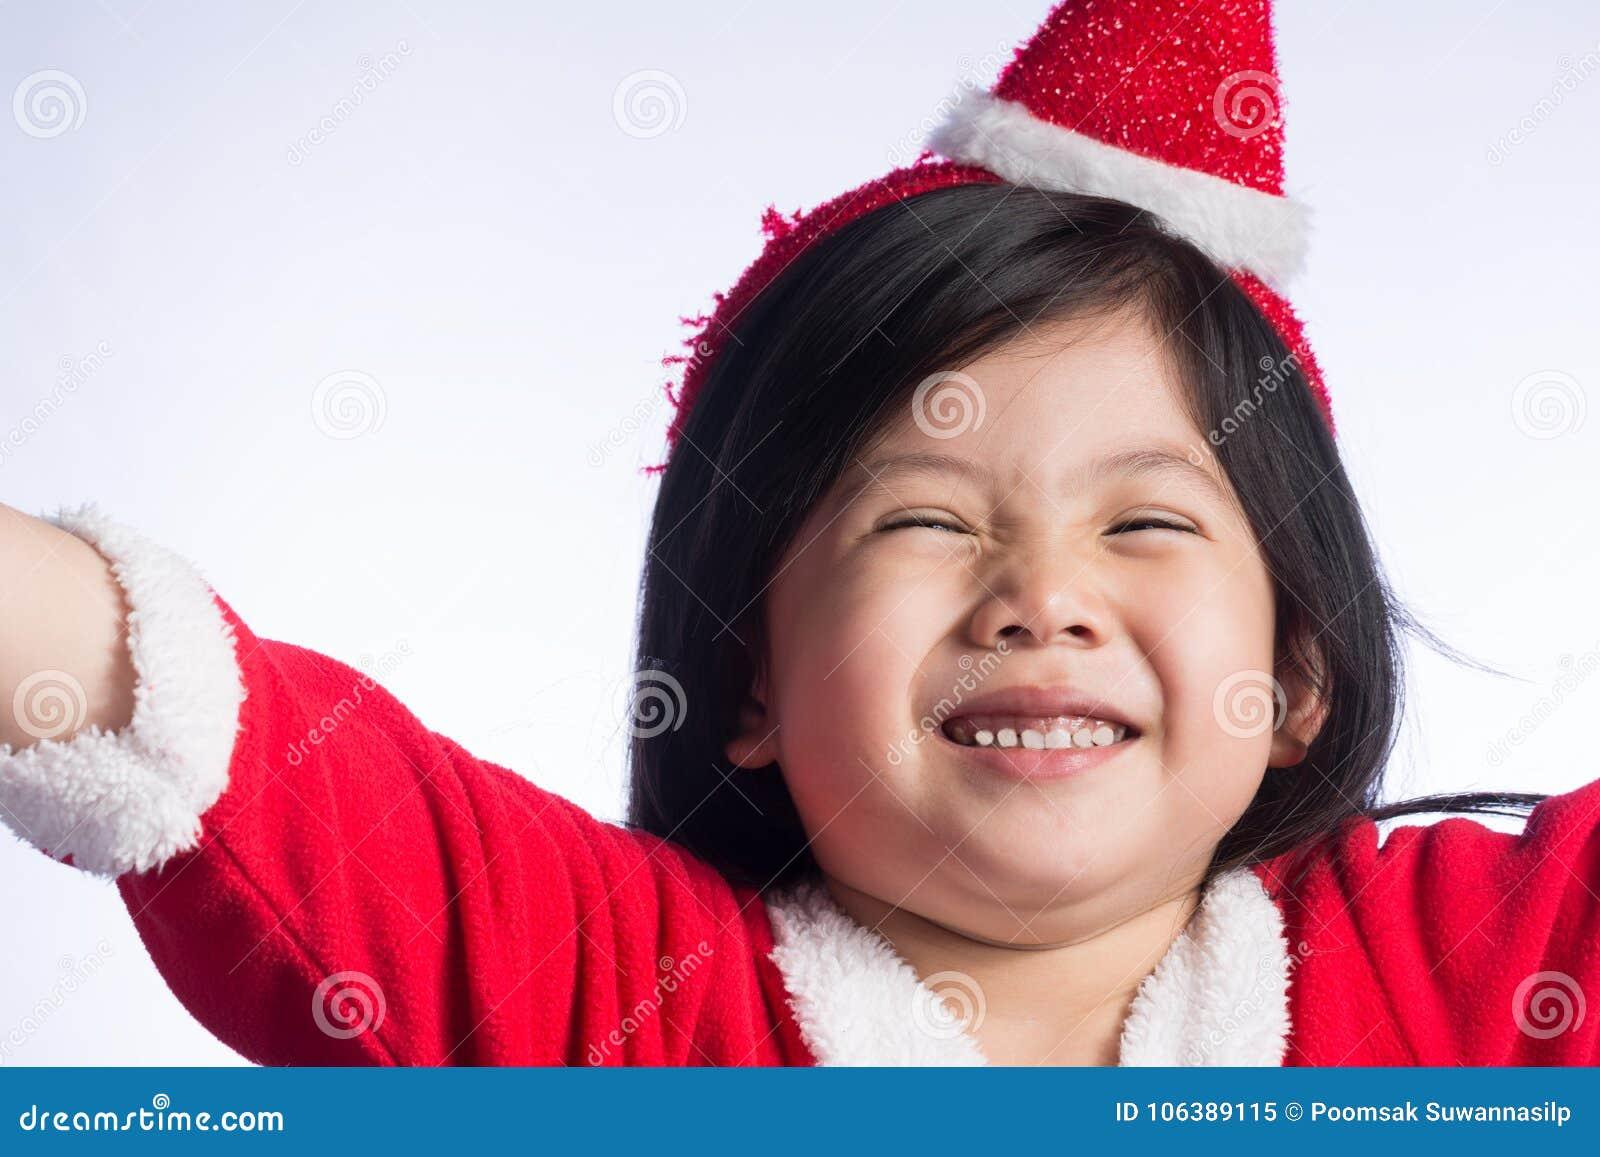 1e957408da7bf A Little Cute Asian Girl In Santa Cross Dress On White Background ...